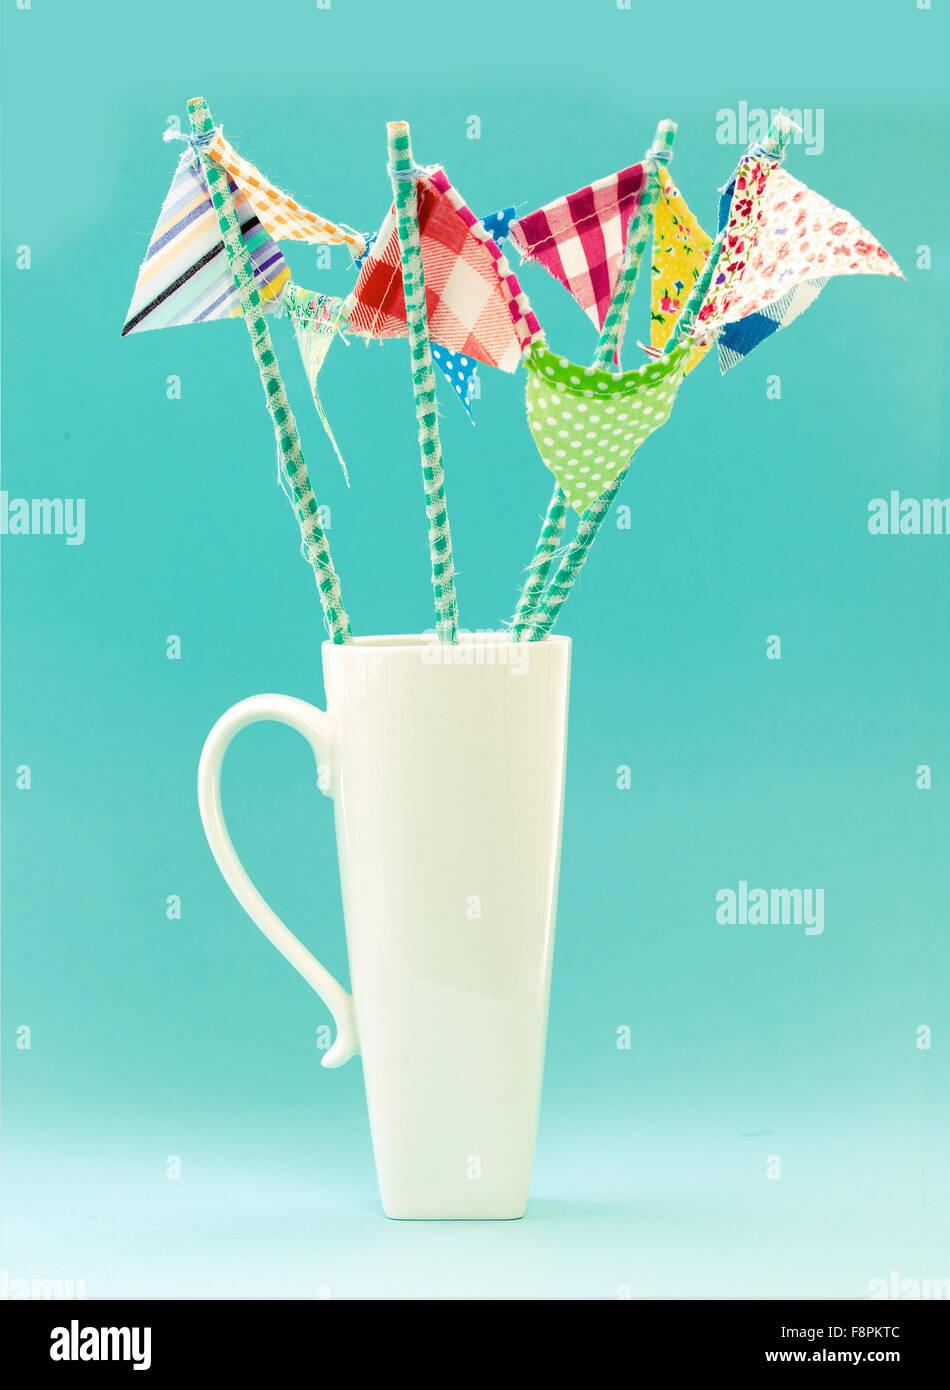 White Mug With Handmade Multicoloured Flags on a Turquoise Retro Background - Stock Image